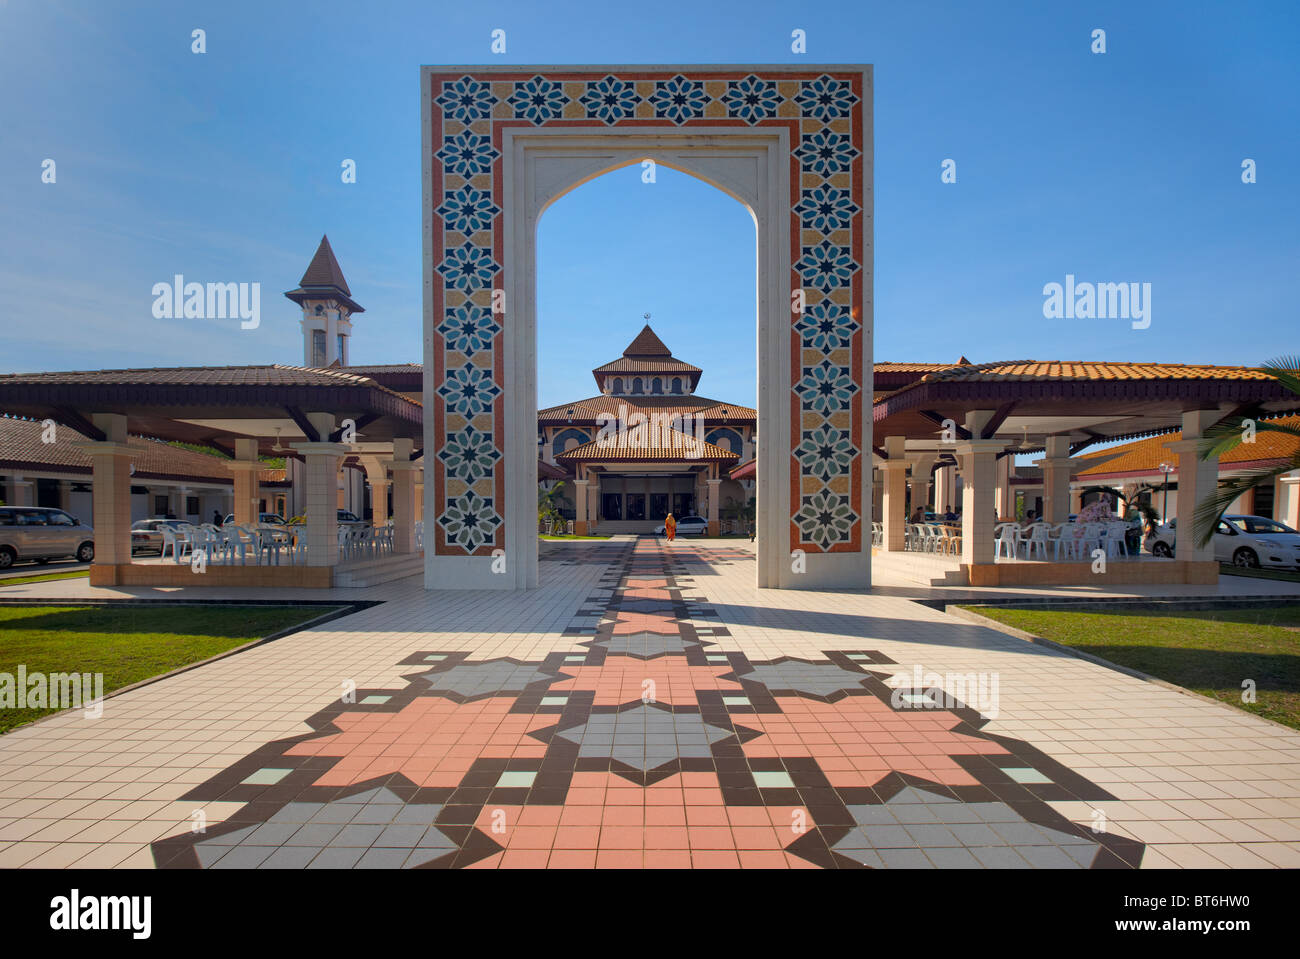 La Universiti Brunei Darussalam Mezquita, Gadong, Brunei Foto de stock